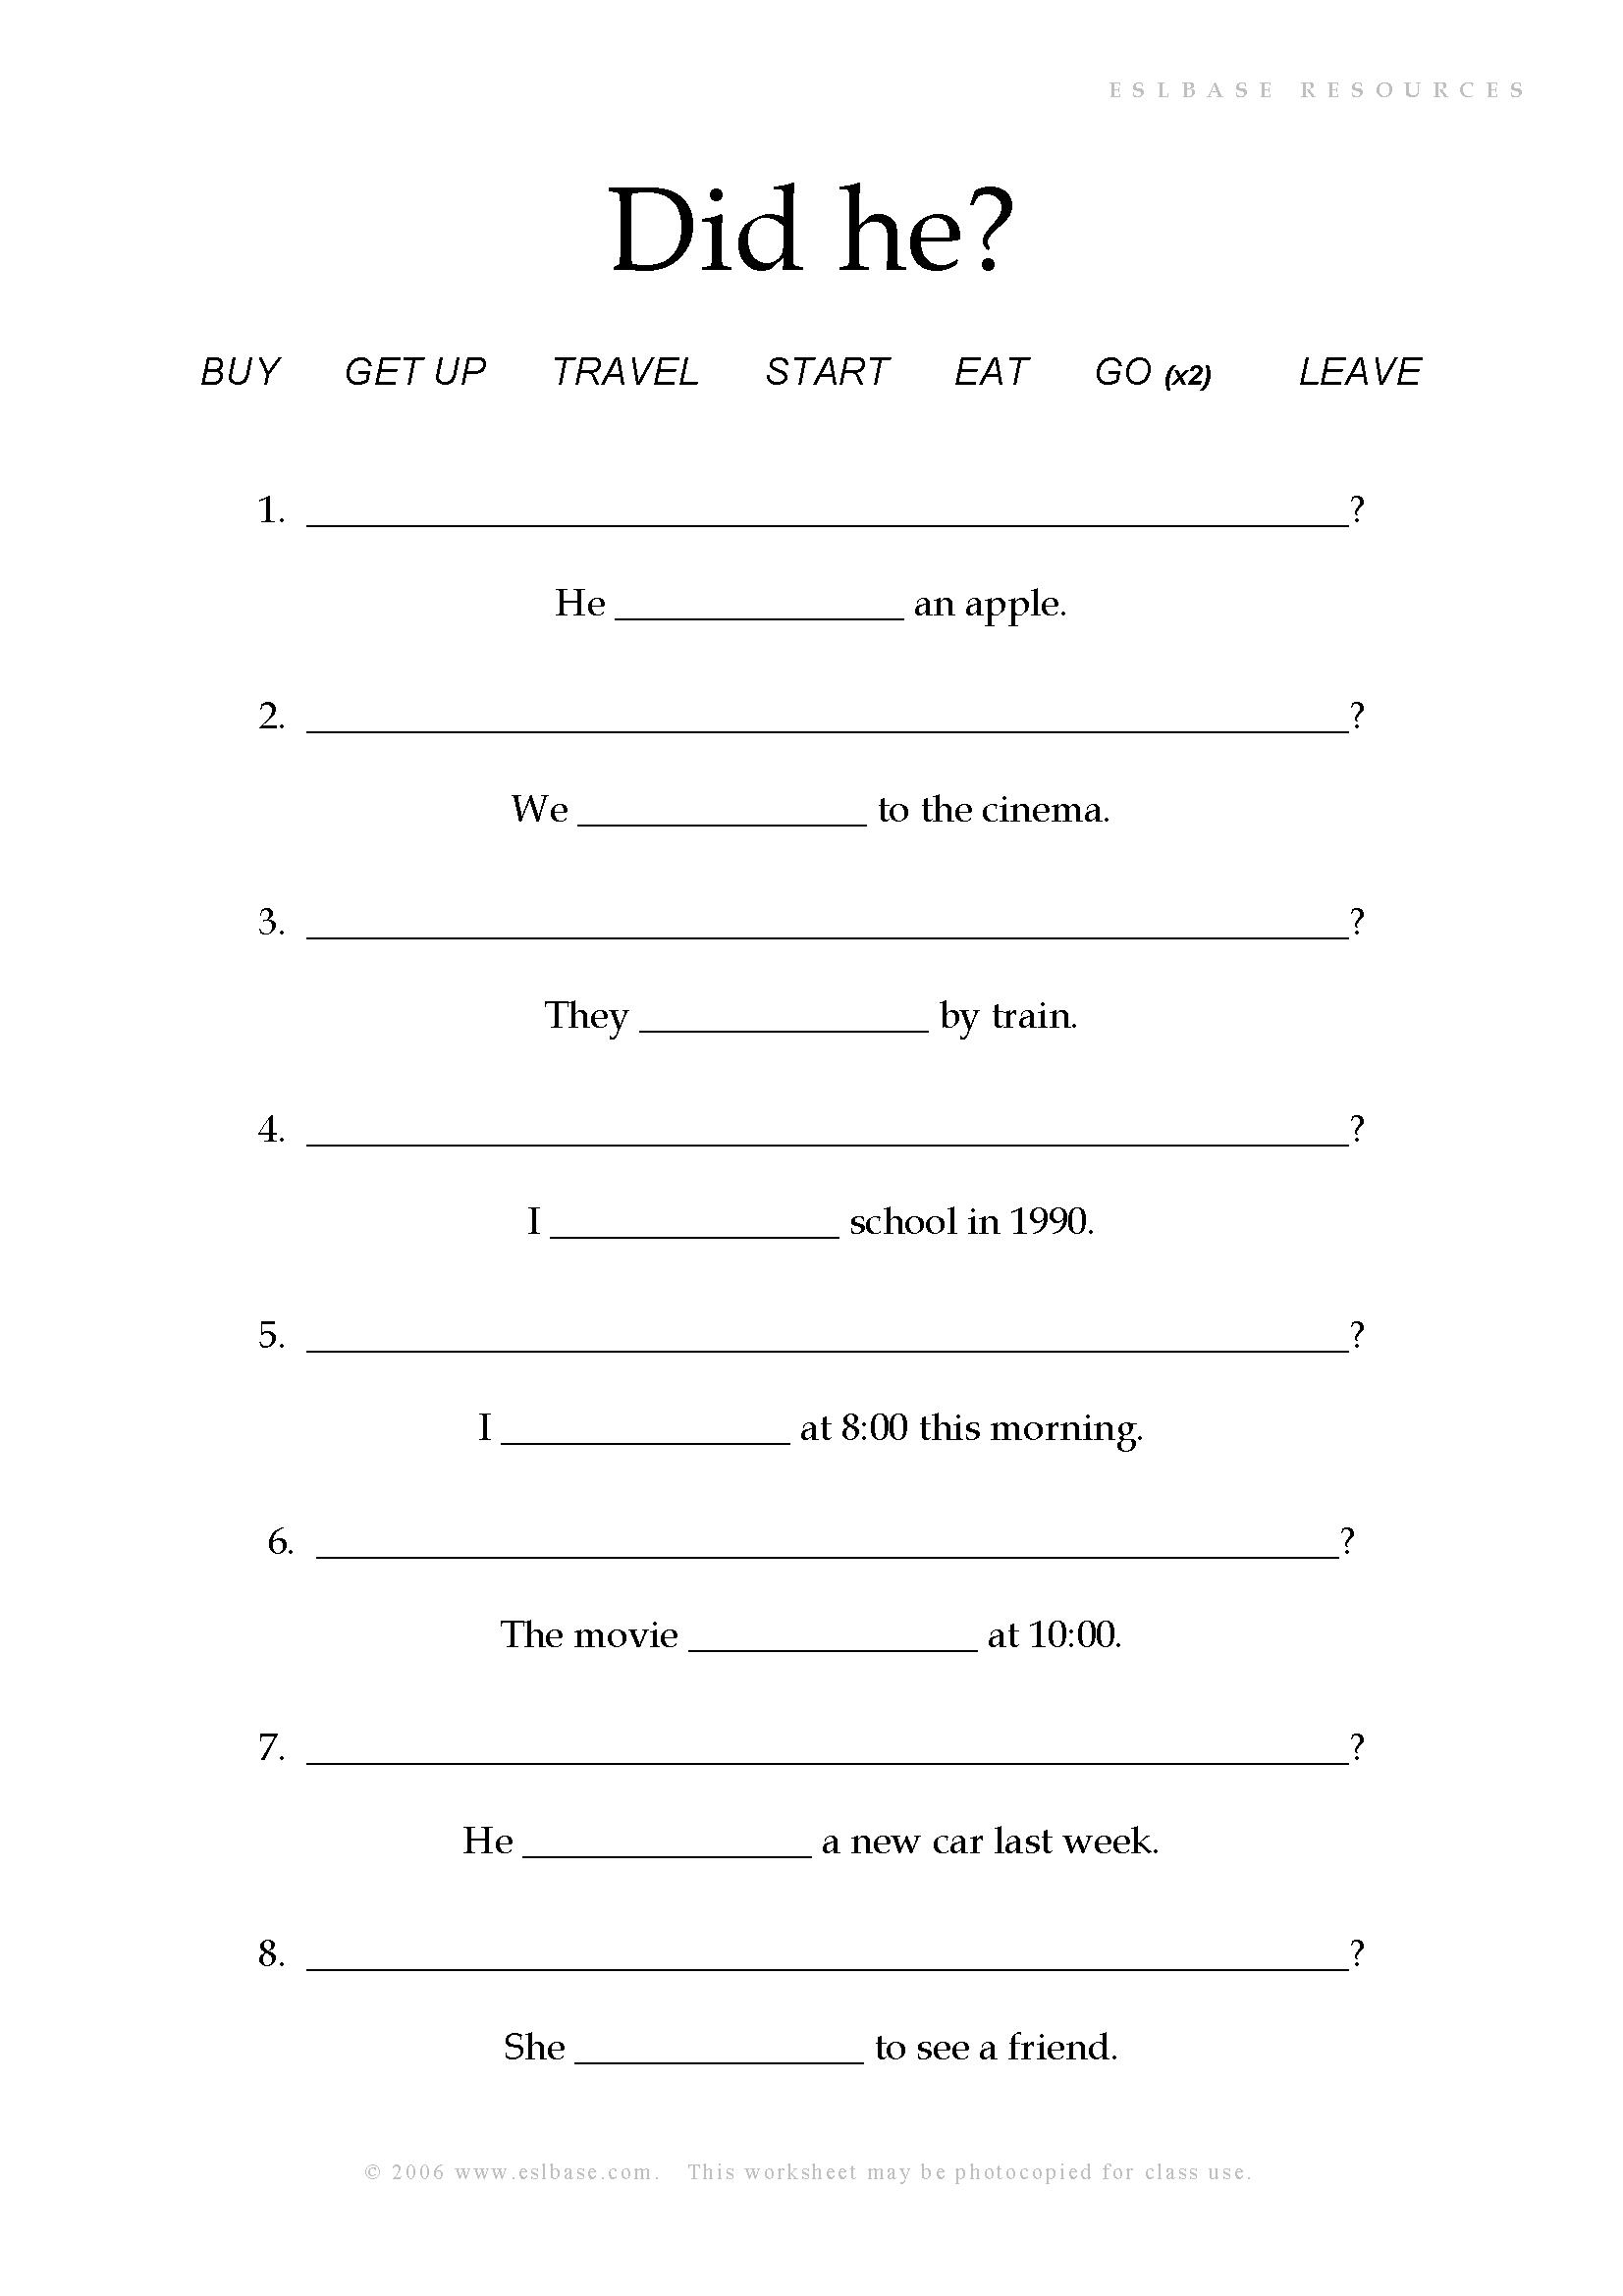 Past Simple Questions Worksheet - Eslbase.com